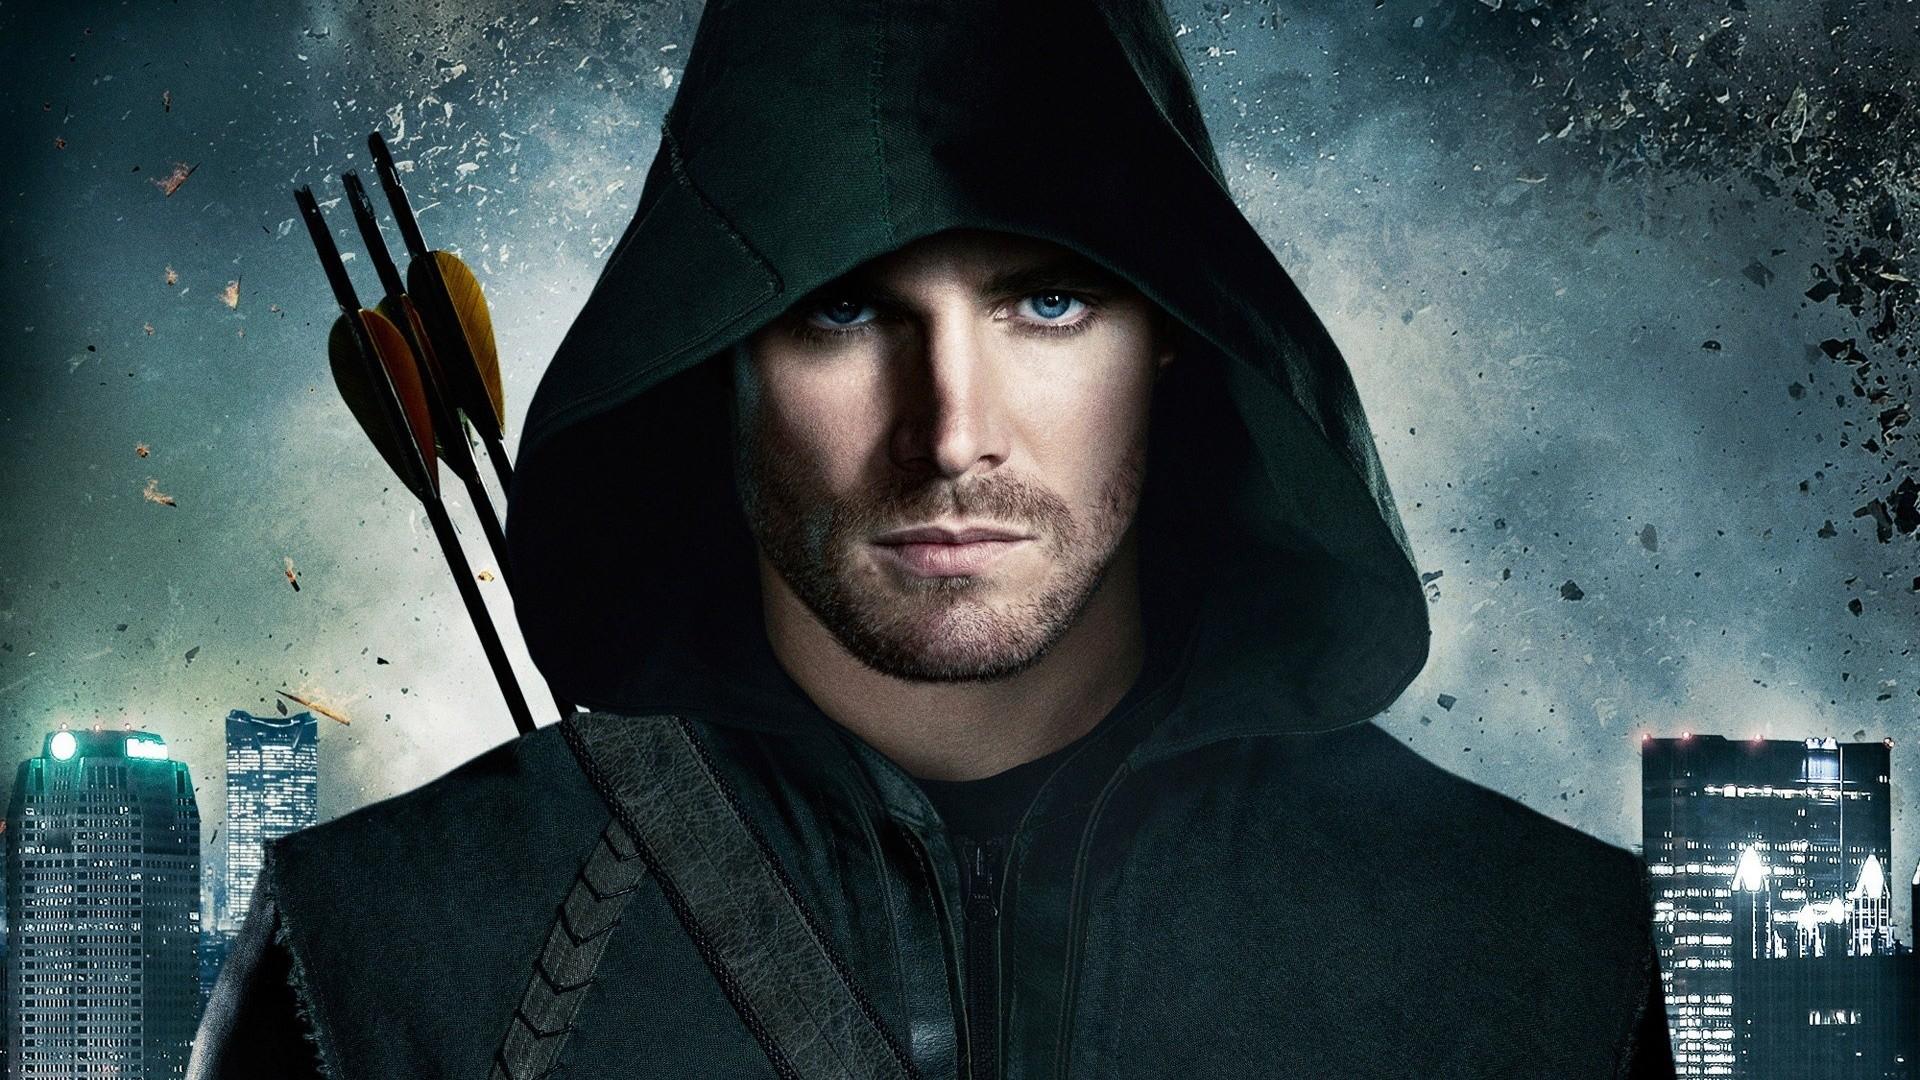 ARROW CW PHOTOS | Arrow – Arrow (CW) Wallpaper (34183835) – Fanpop